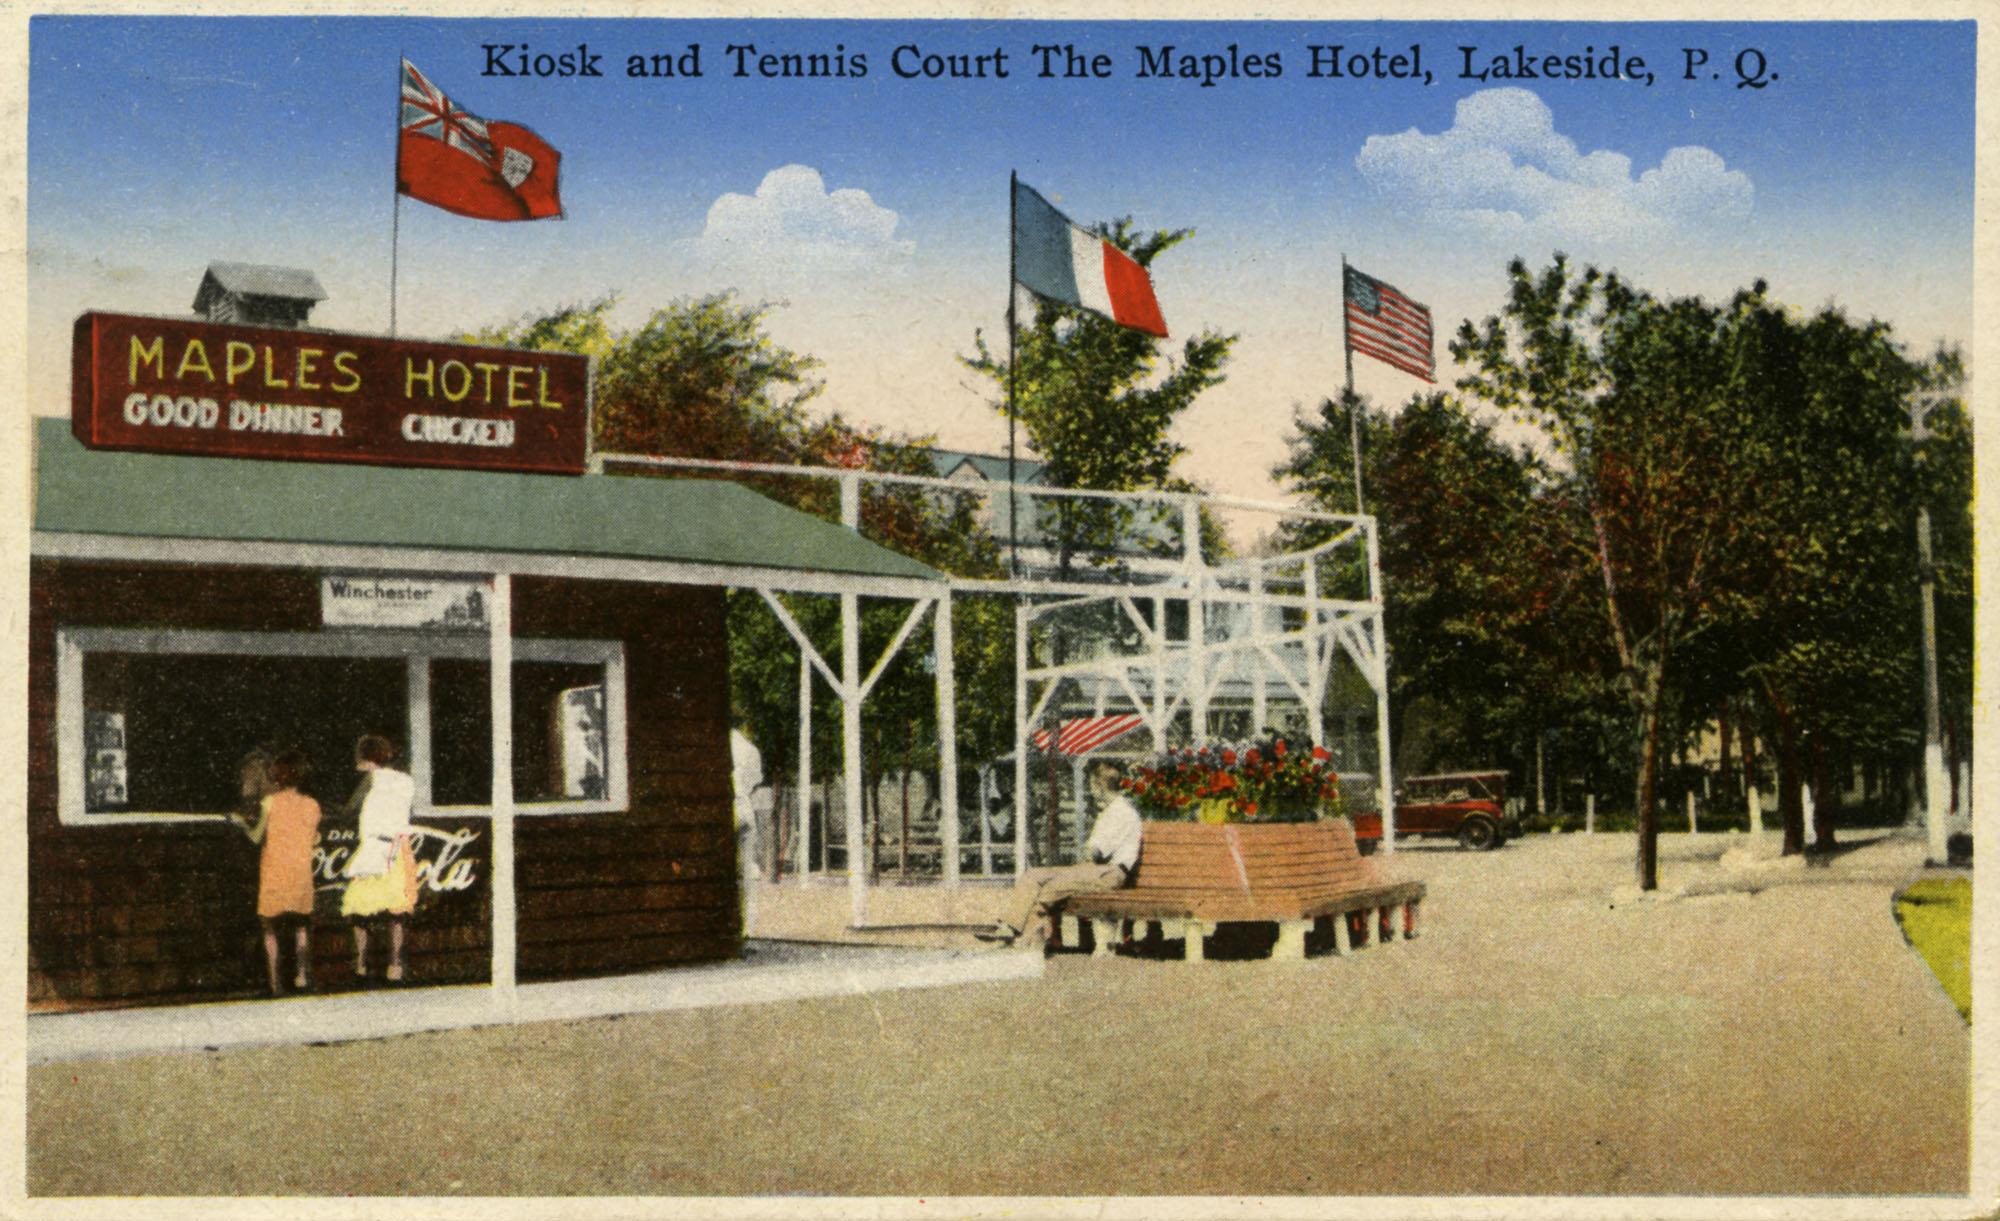 Carte postale du snack-bar et du terrain de tennis du Maples Inn vers 1941.